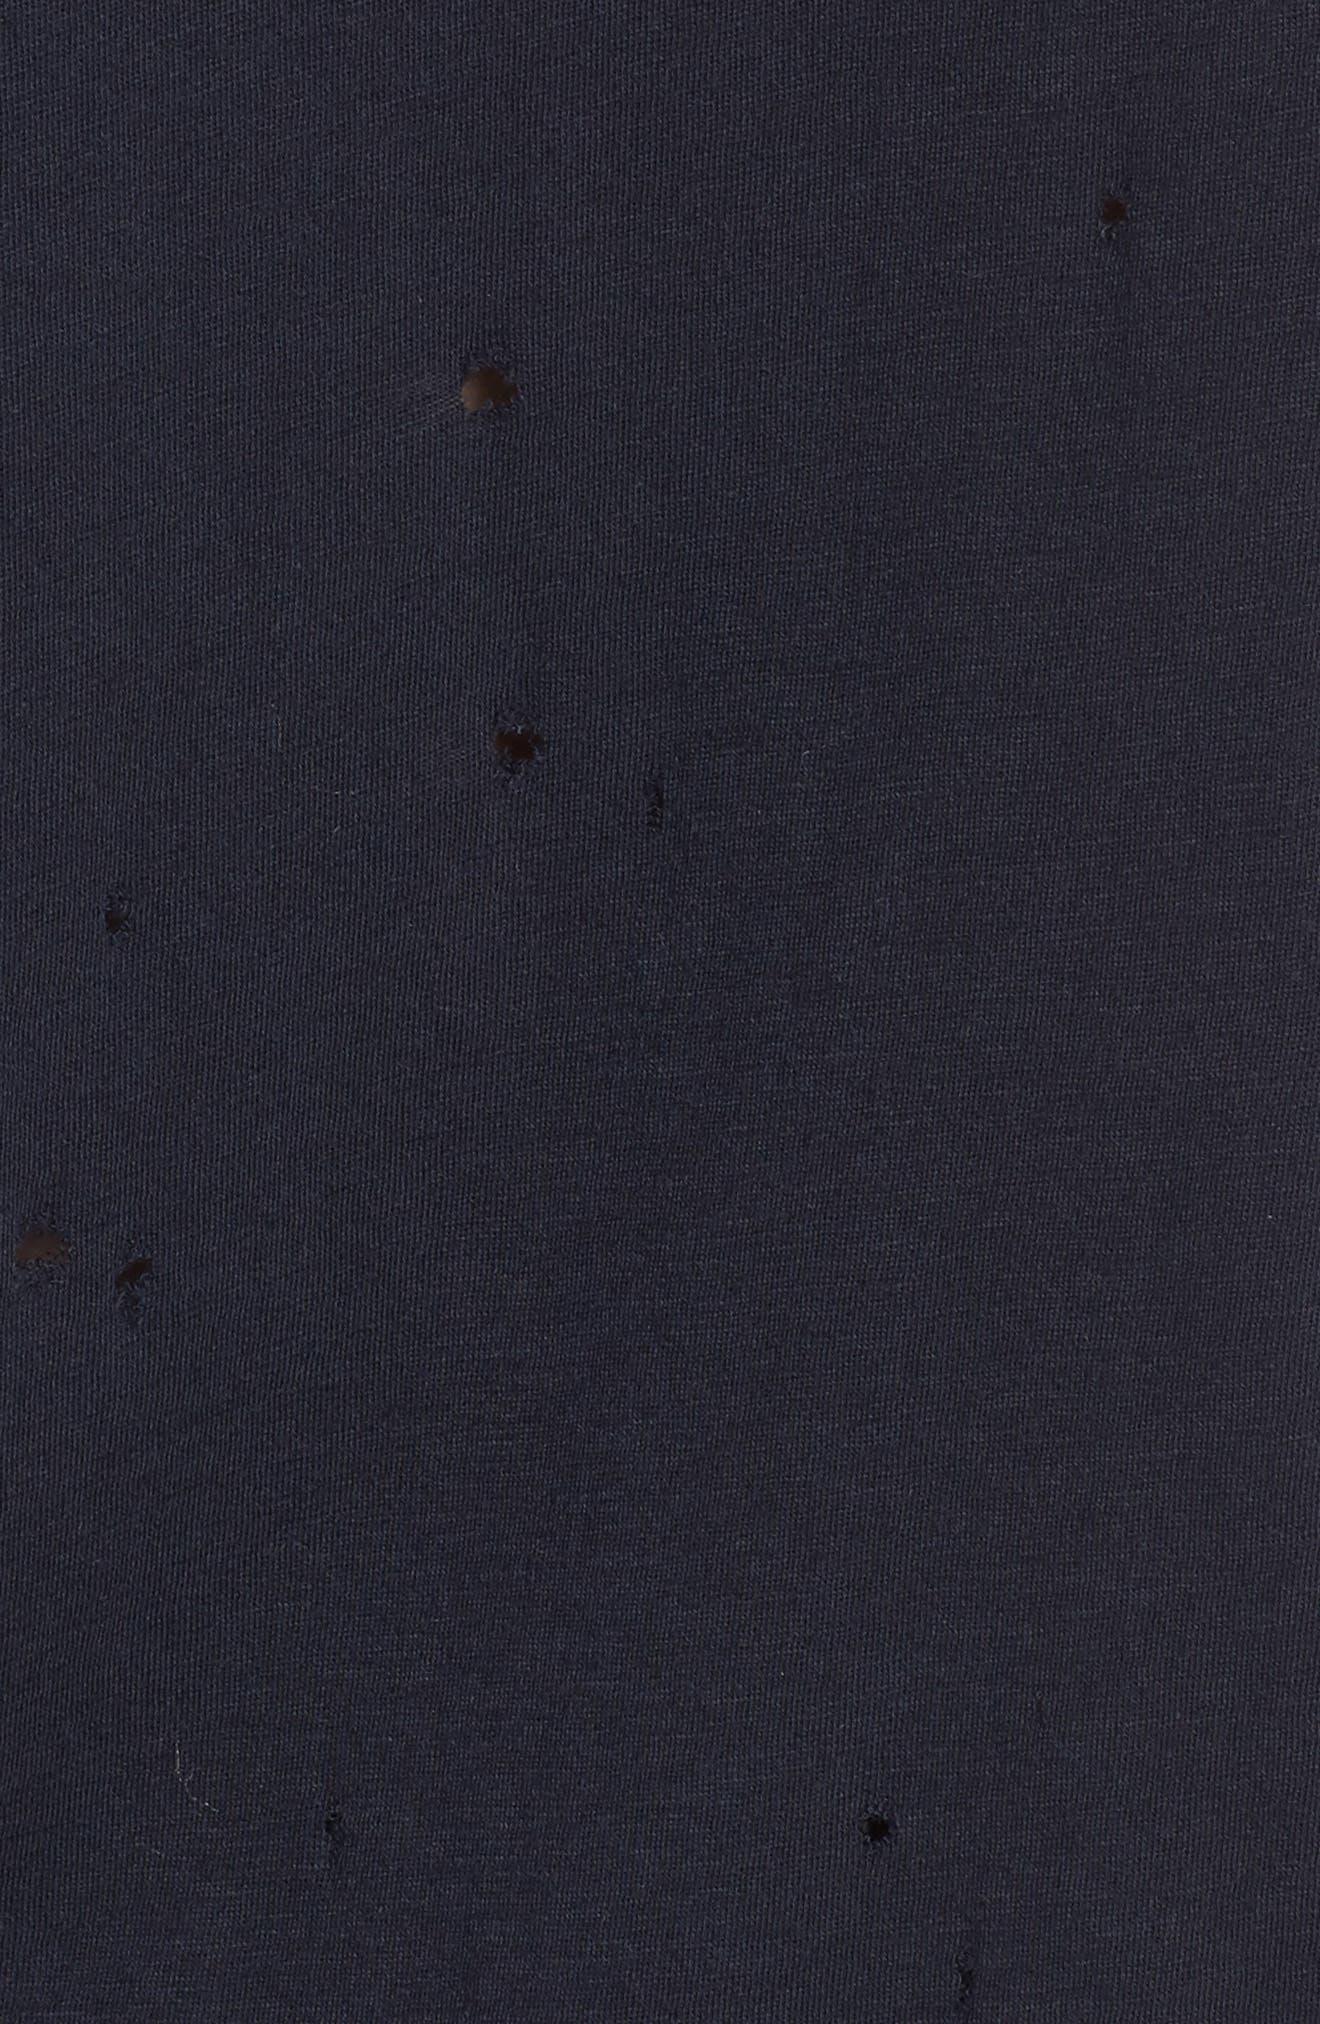 'Wassa' Destroyed V-Neck Tee,                             Alternate thumbnail 5, color,                             Marine